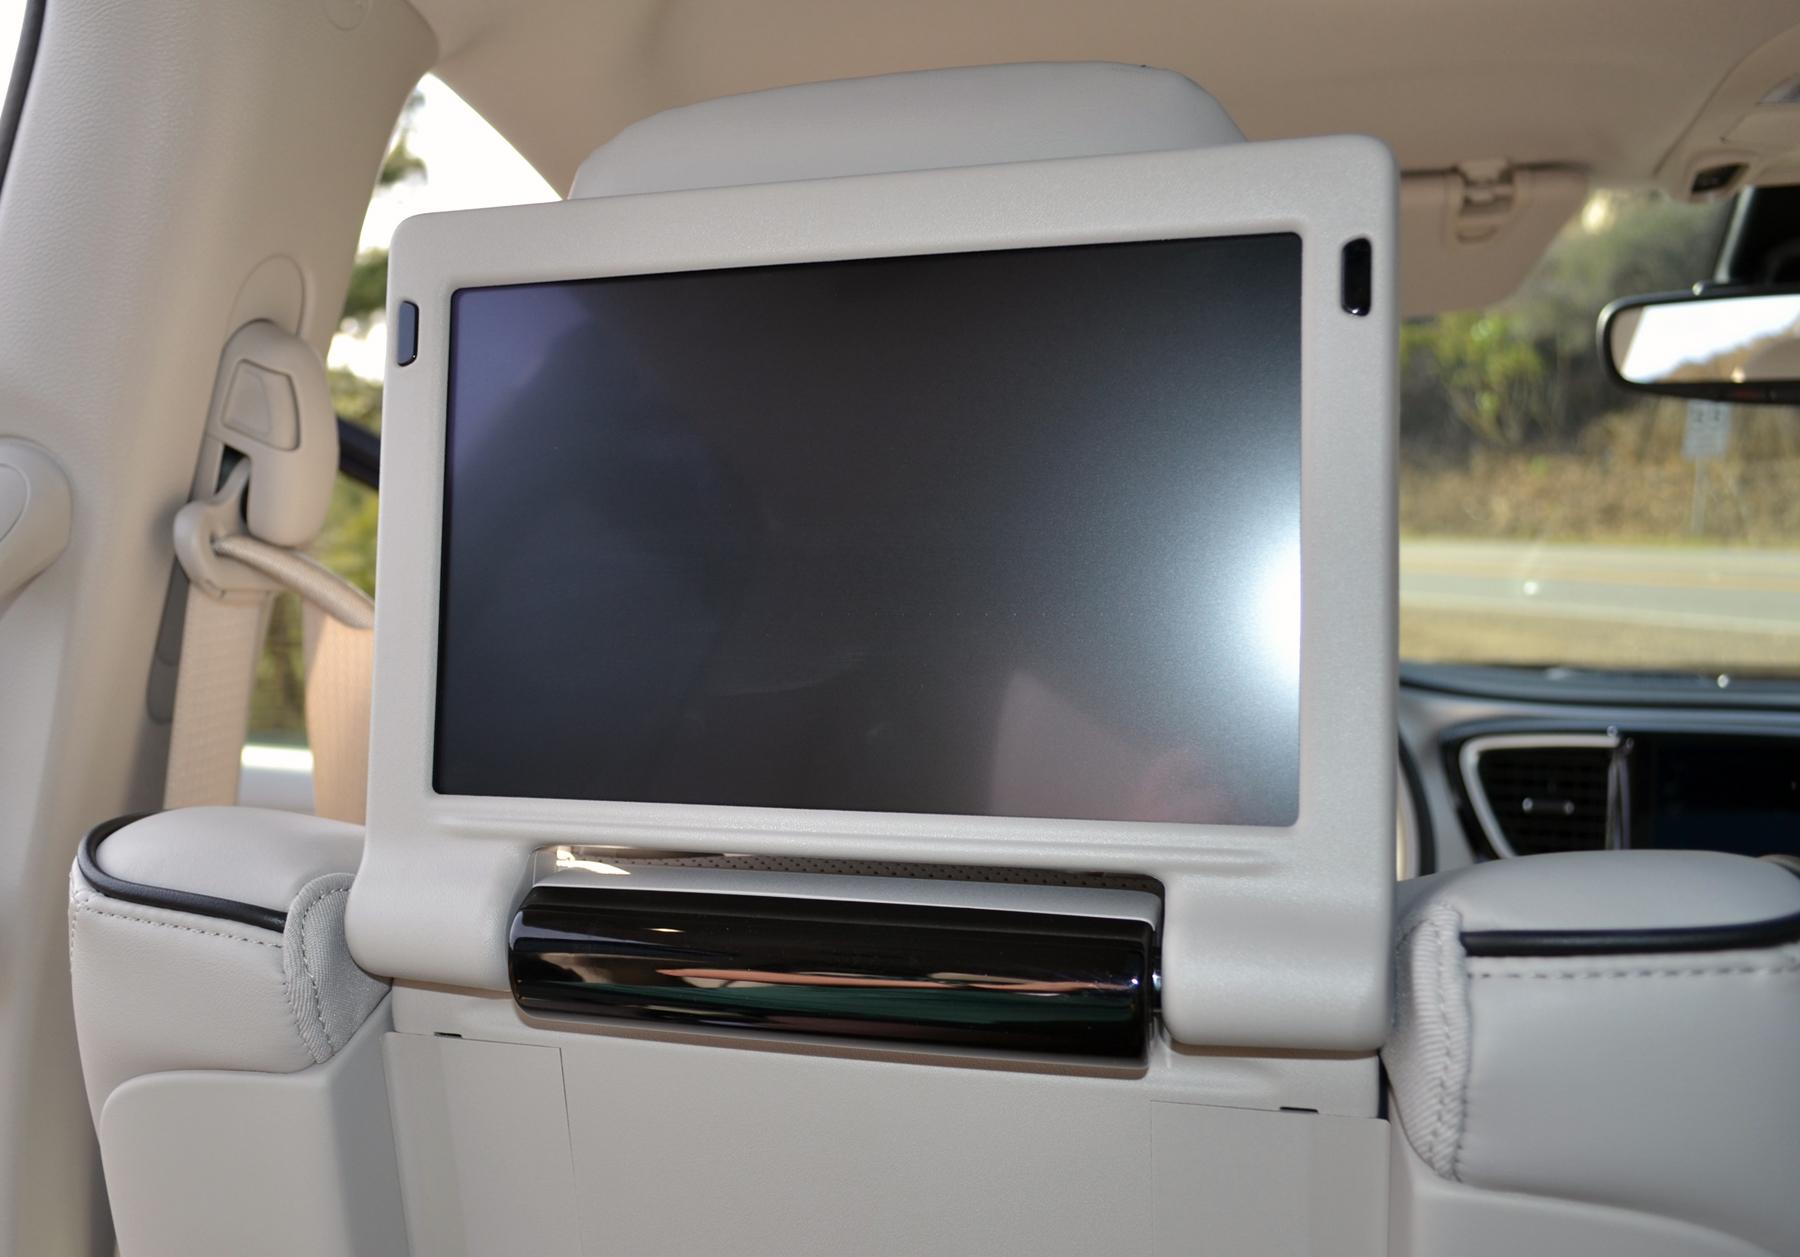 Hybrid Rebates Hybrid Pacifica Is A Fca Game Changer Wheelsca